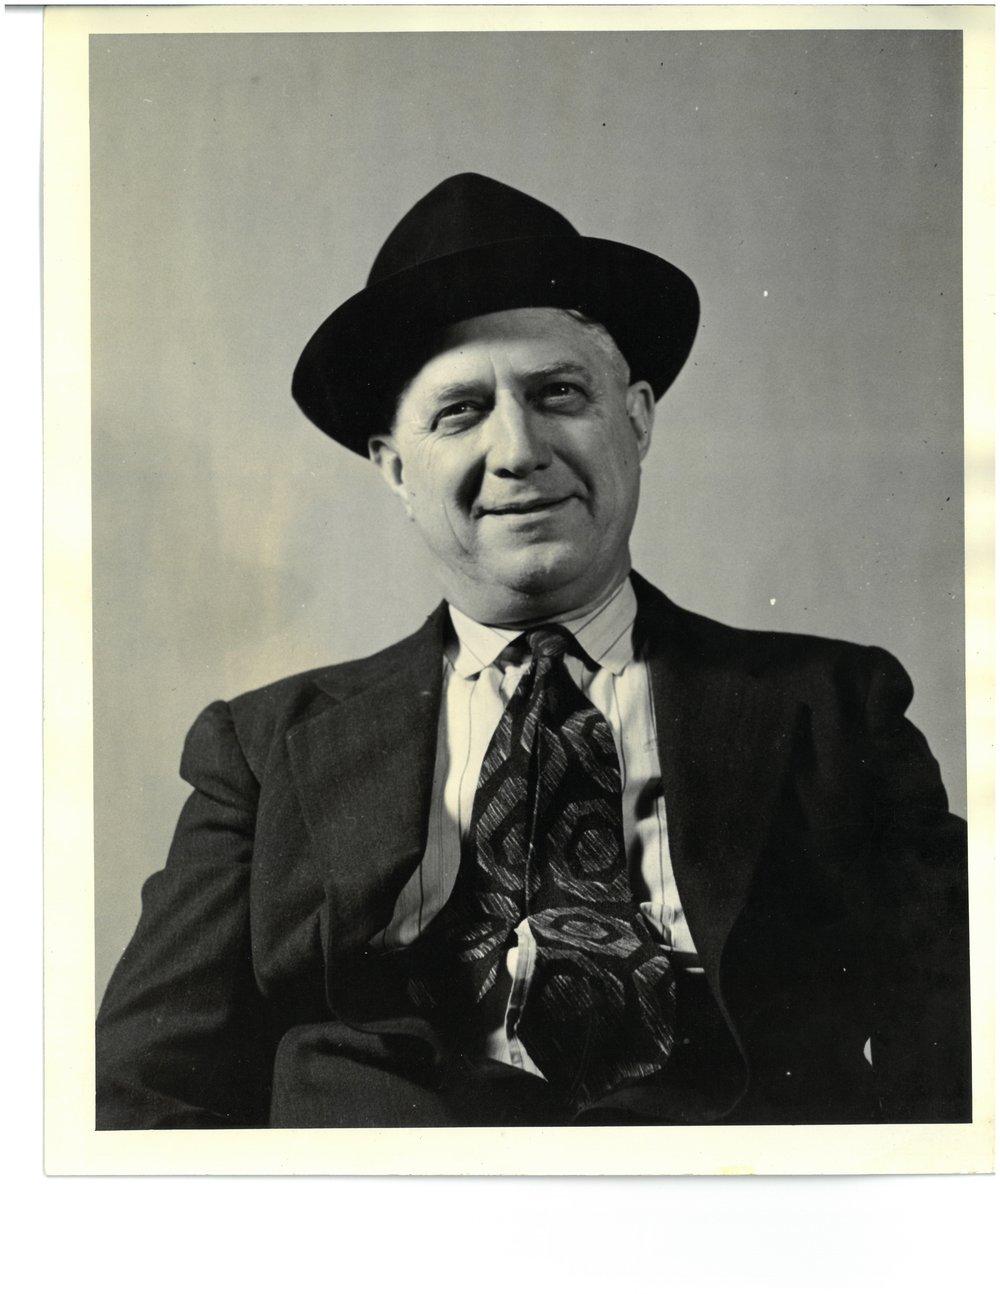 W. Bruce Aspley